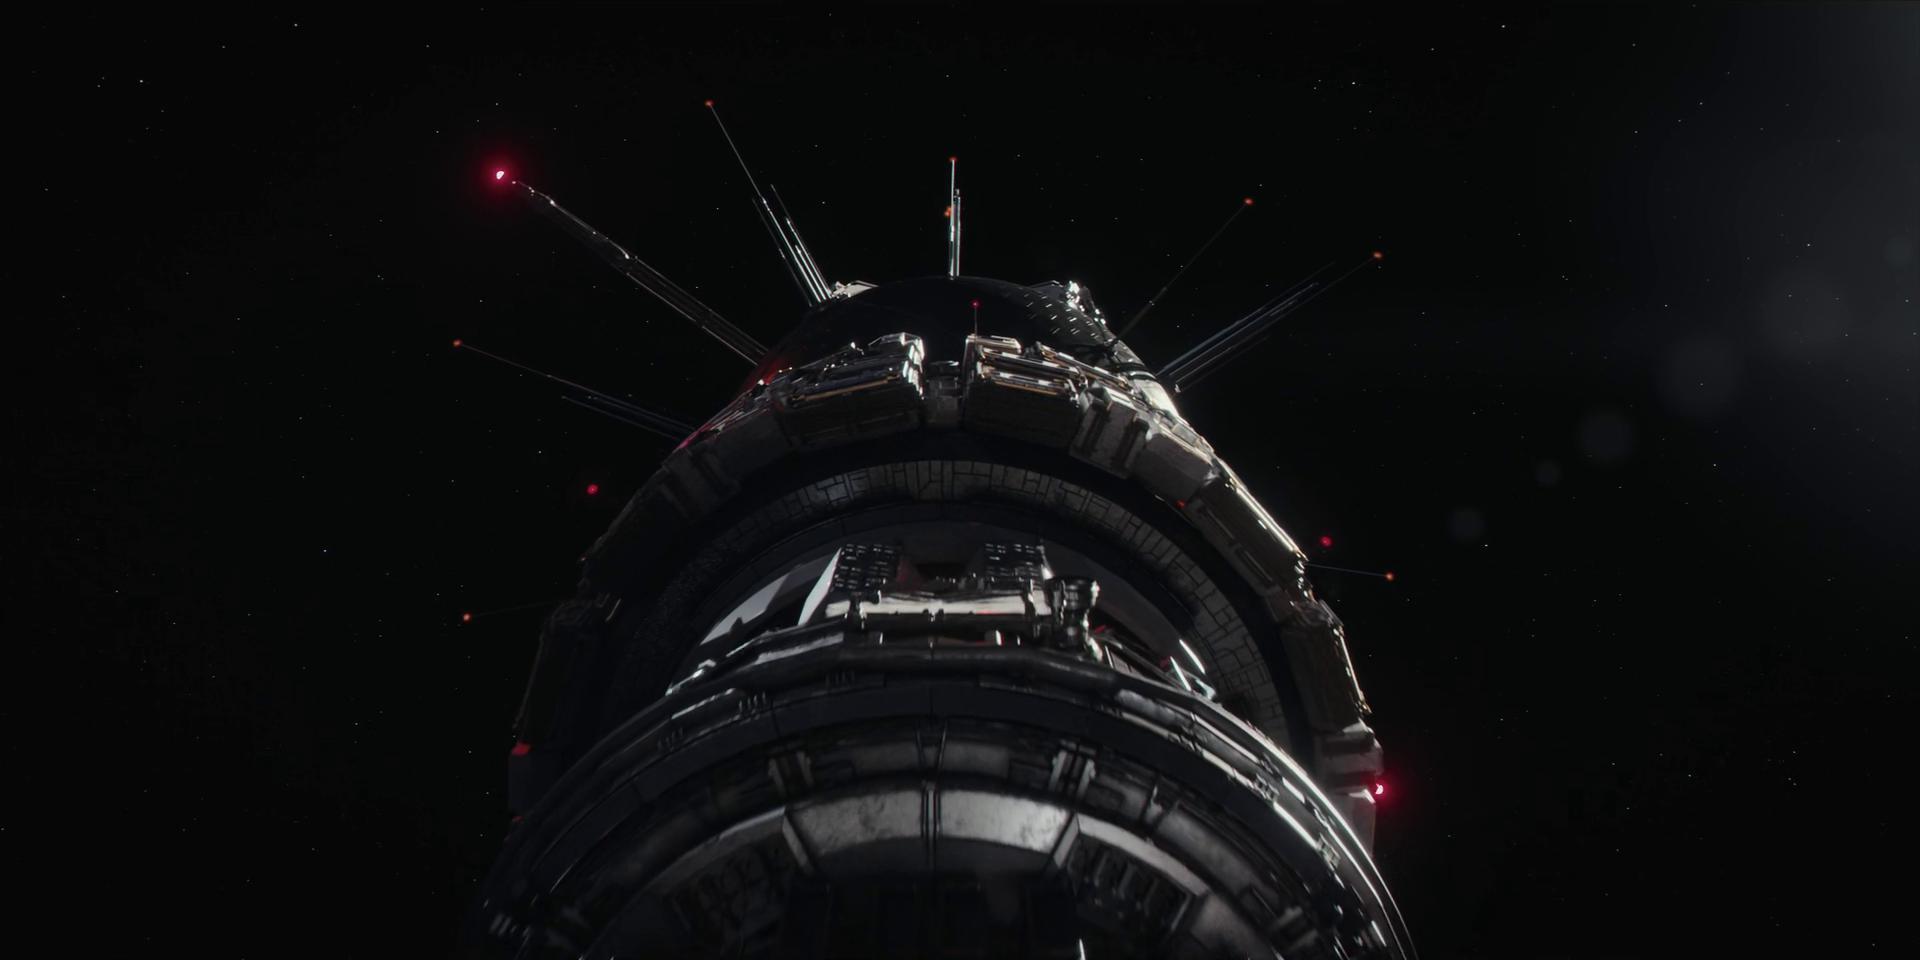 Nightflyers - Stagione 1 (2019) (Completa) WEBRip 1080P HEVC ITA ENG DD5.1 x265 mkv Vlcsnap-2019-02-02-02jhj0d